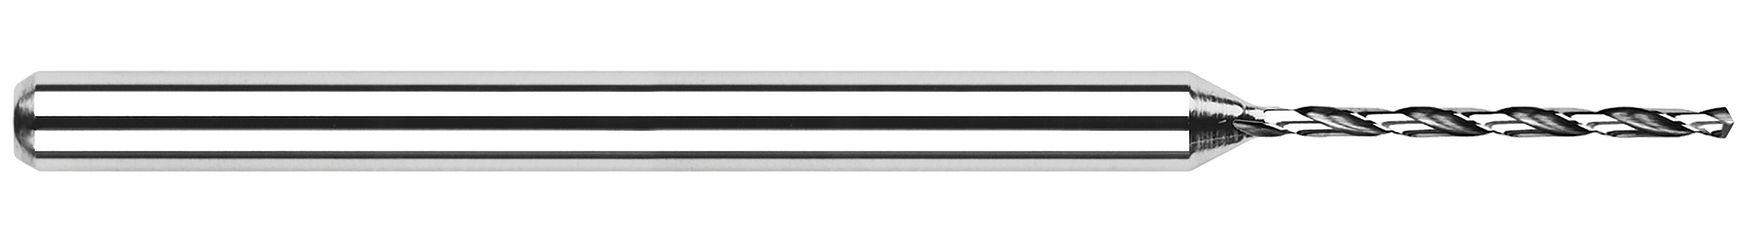 tool-details-20409